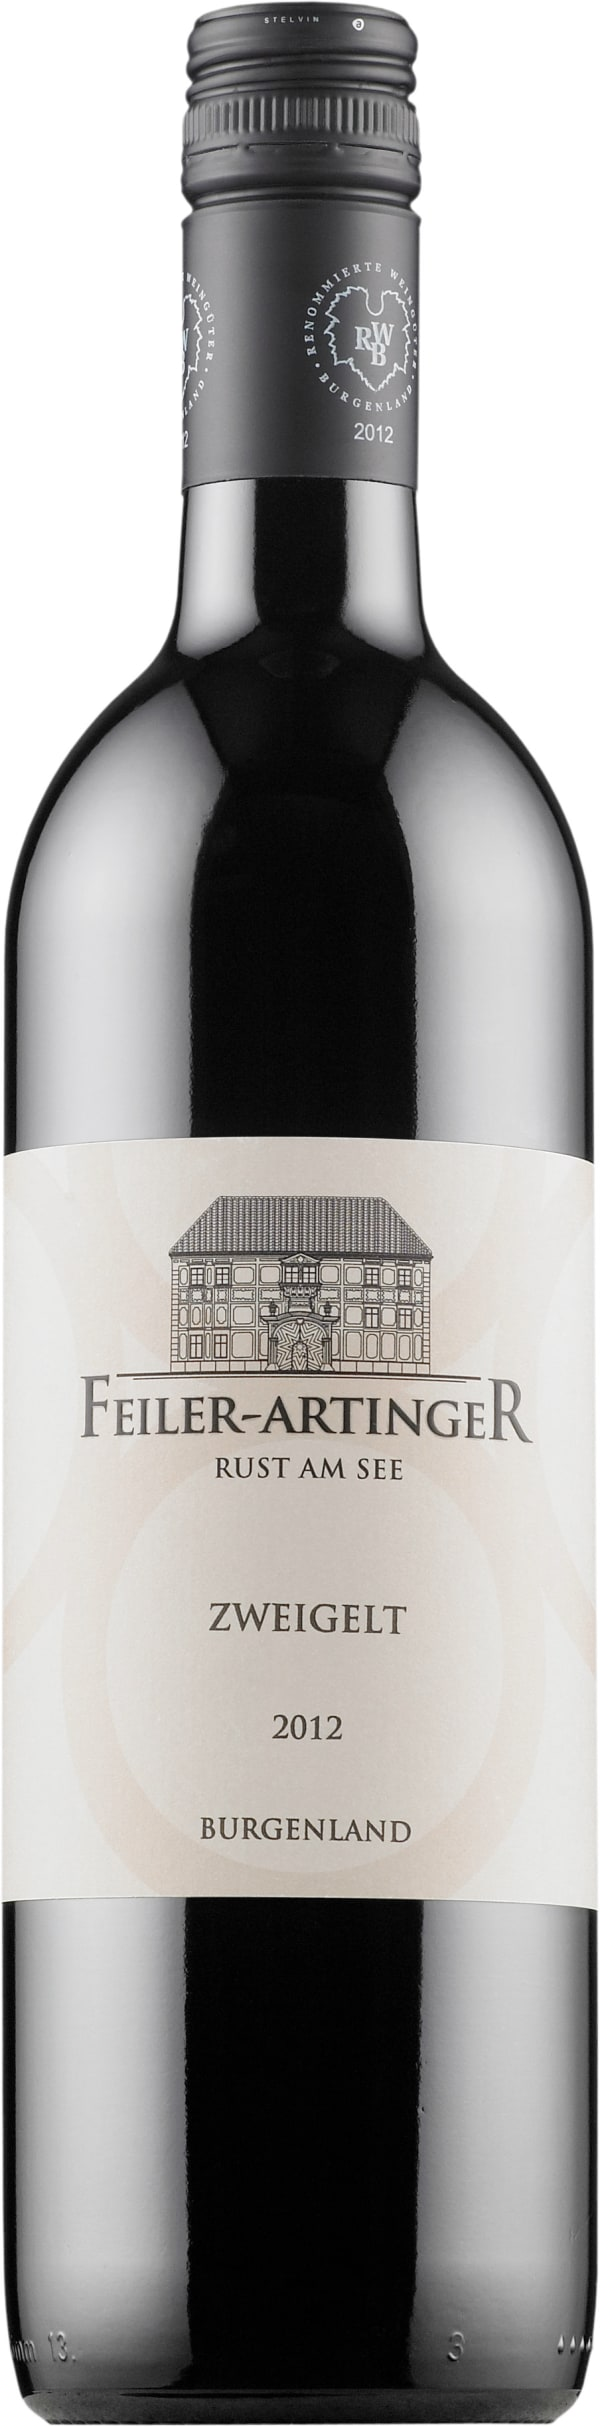 Feiler-Artinger Zweigelt 2016